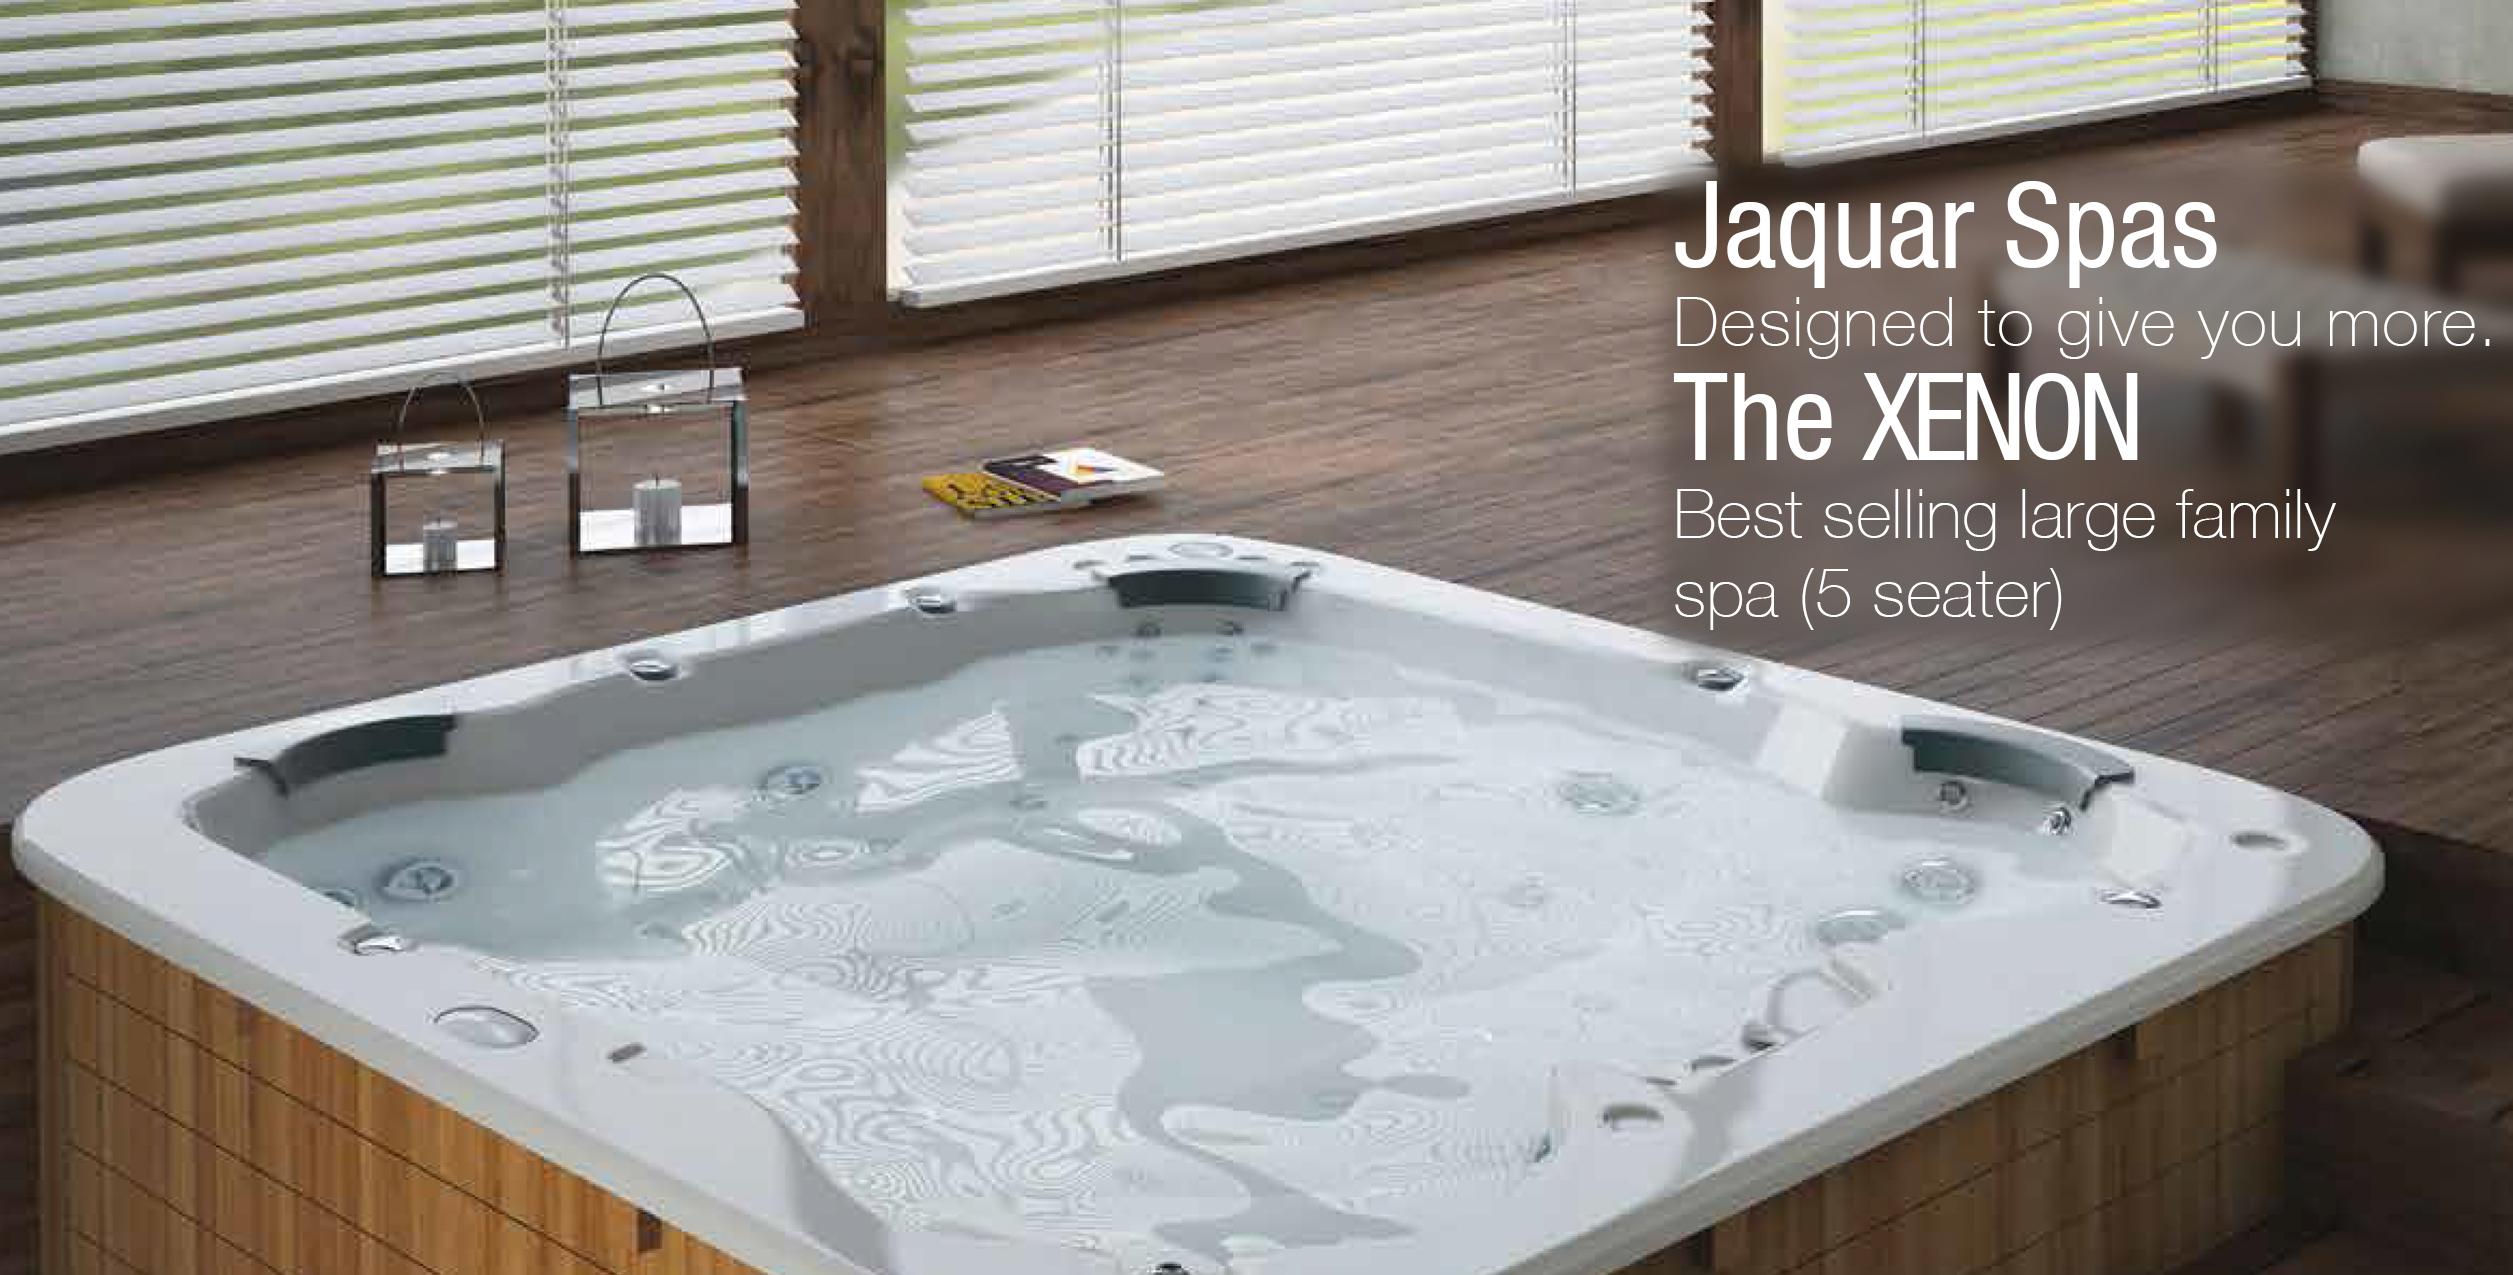 Complete Bathroom Solutions-Jaquar Spas xenone